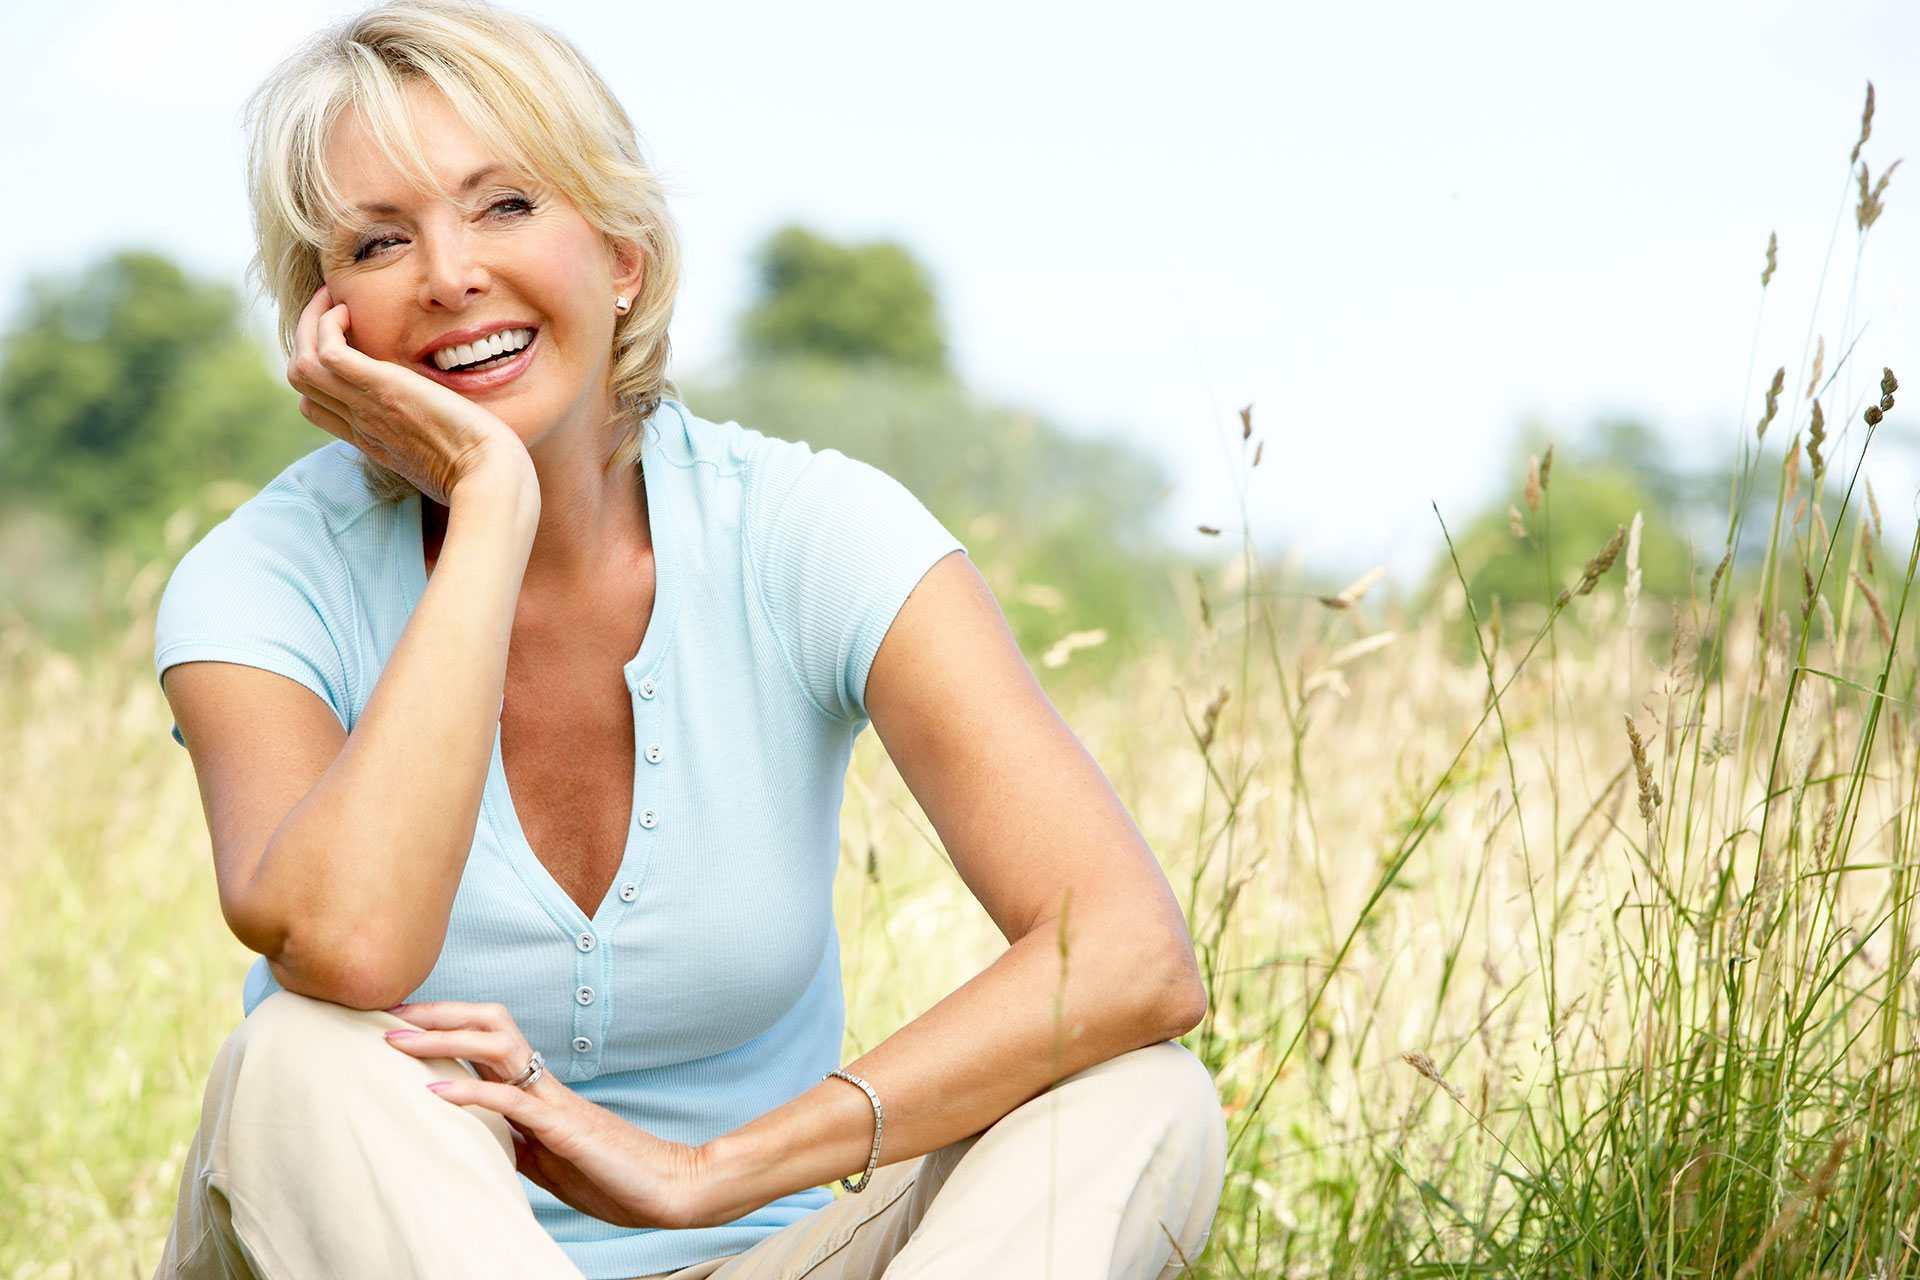 Sophy gel utice podsticajno na sex u menopauzi, utice na suvocu vagine i poboljsava vlaznost.